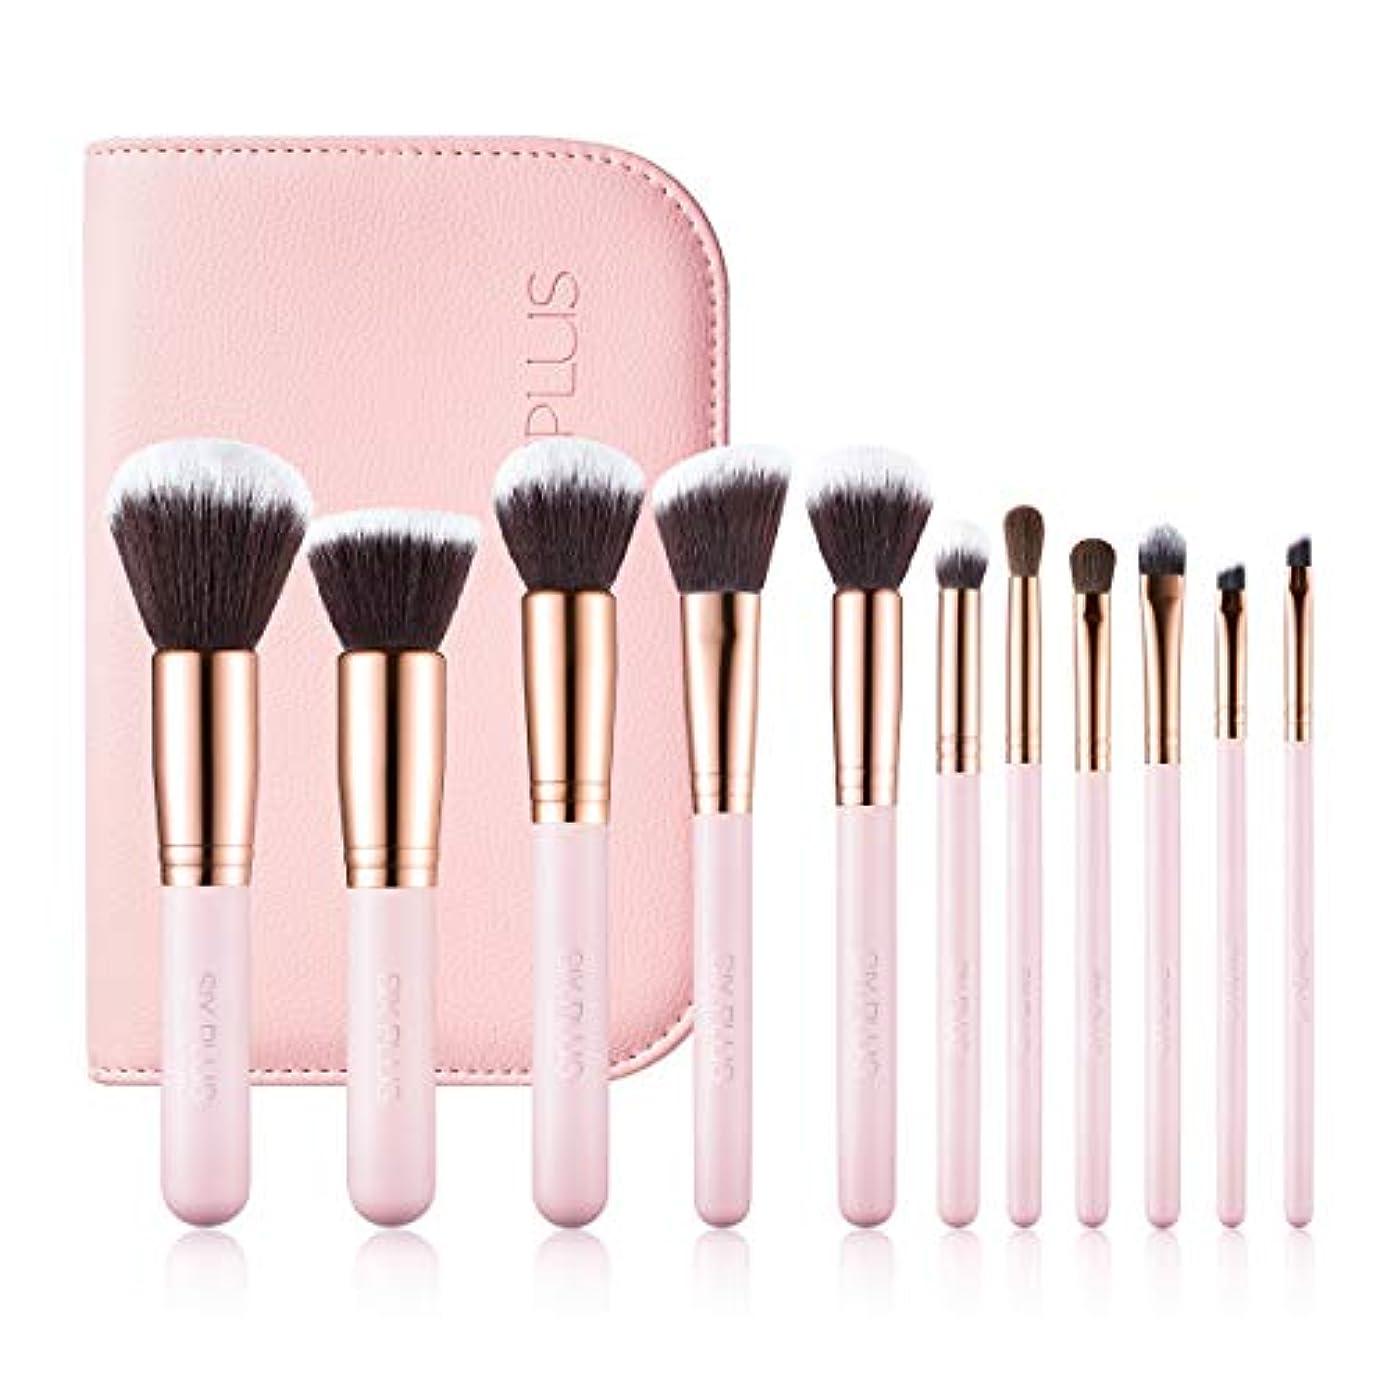 SIXPLUS メイクブラシ11本セット 化粧ポーチ付き (ピンク)